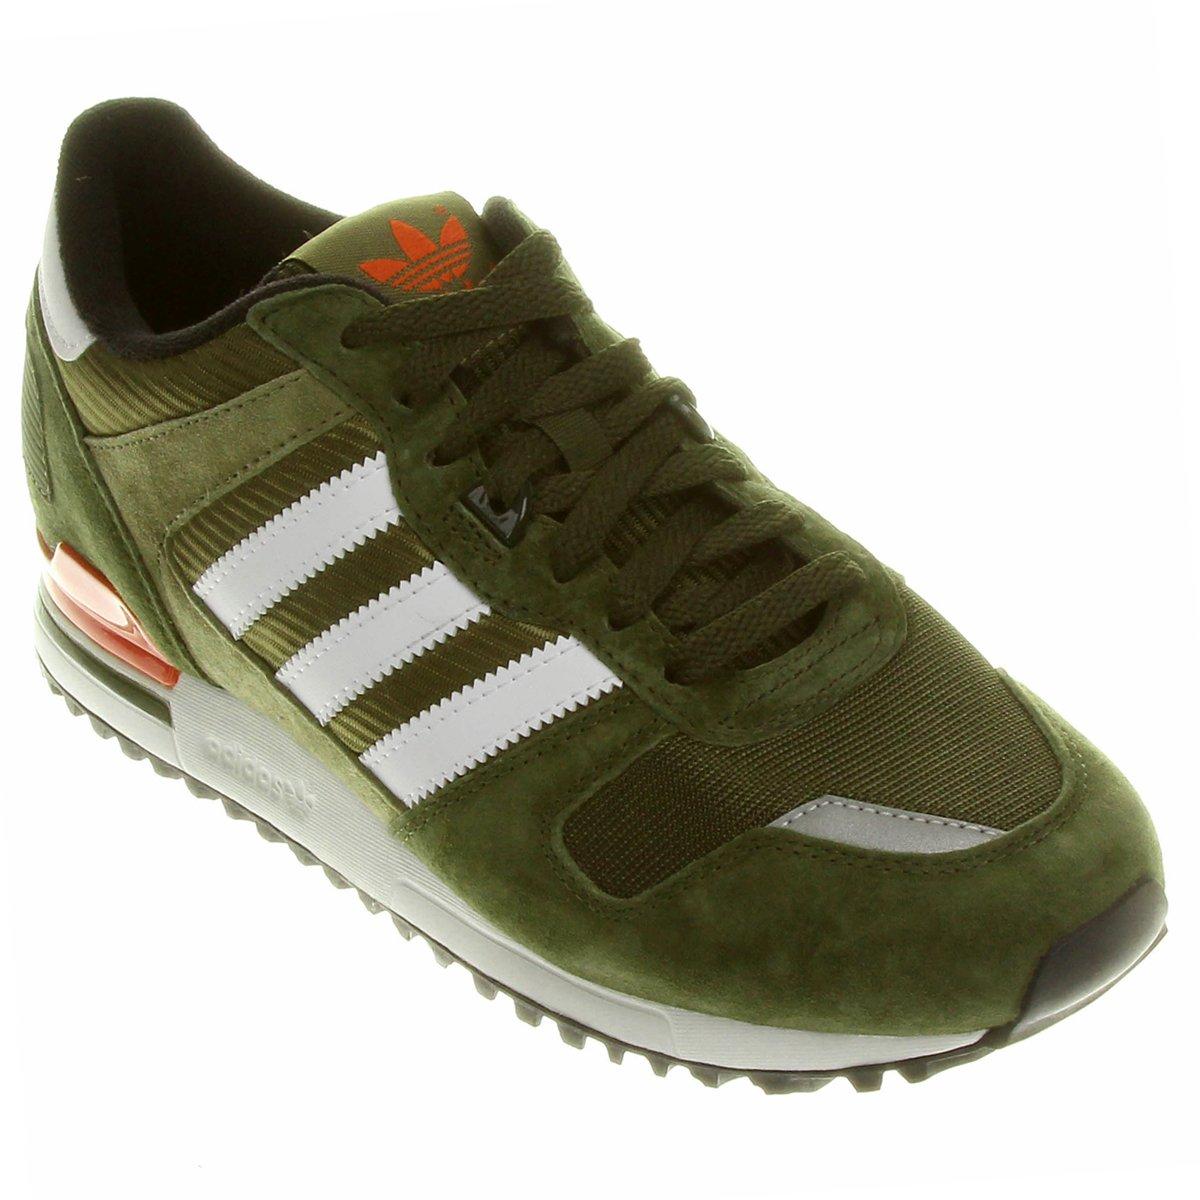 d2d089e654f58 best price tênis adidas zx 700 verde militarbranco b2c07 ecc4b